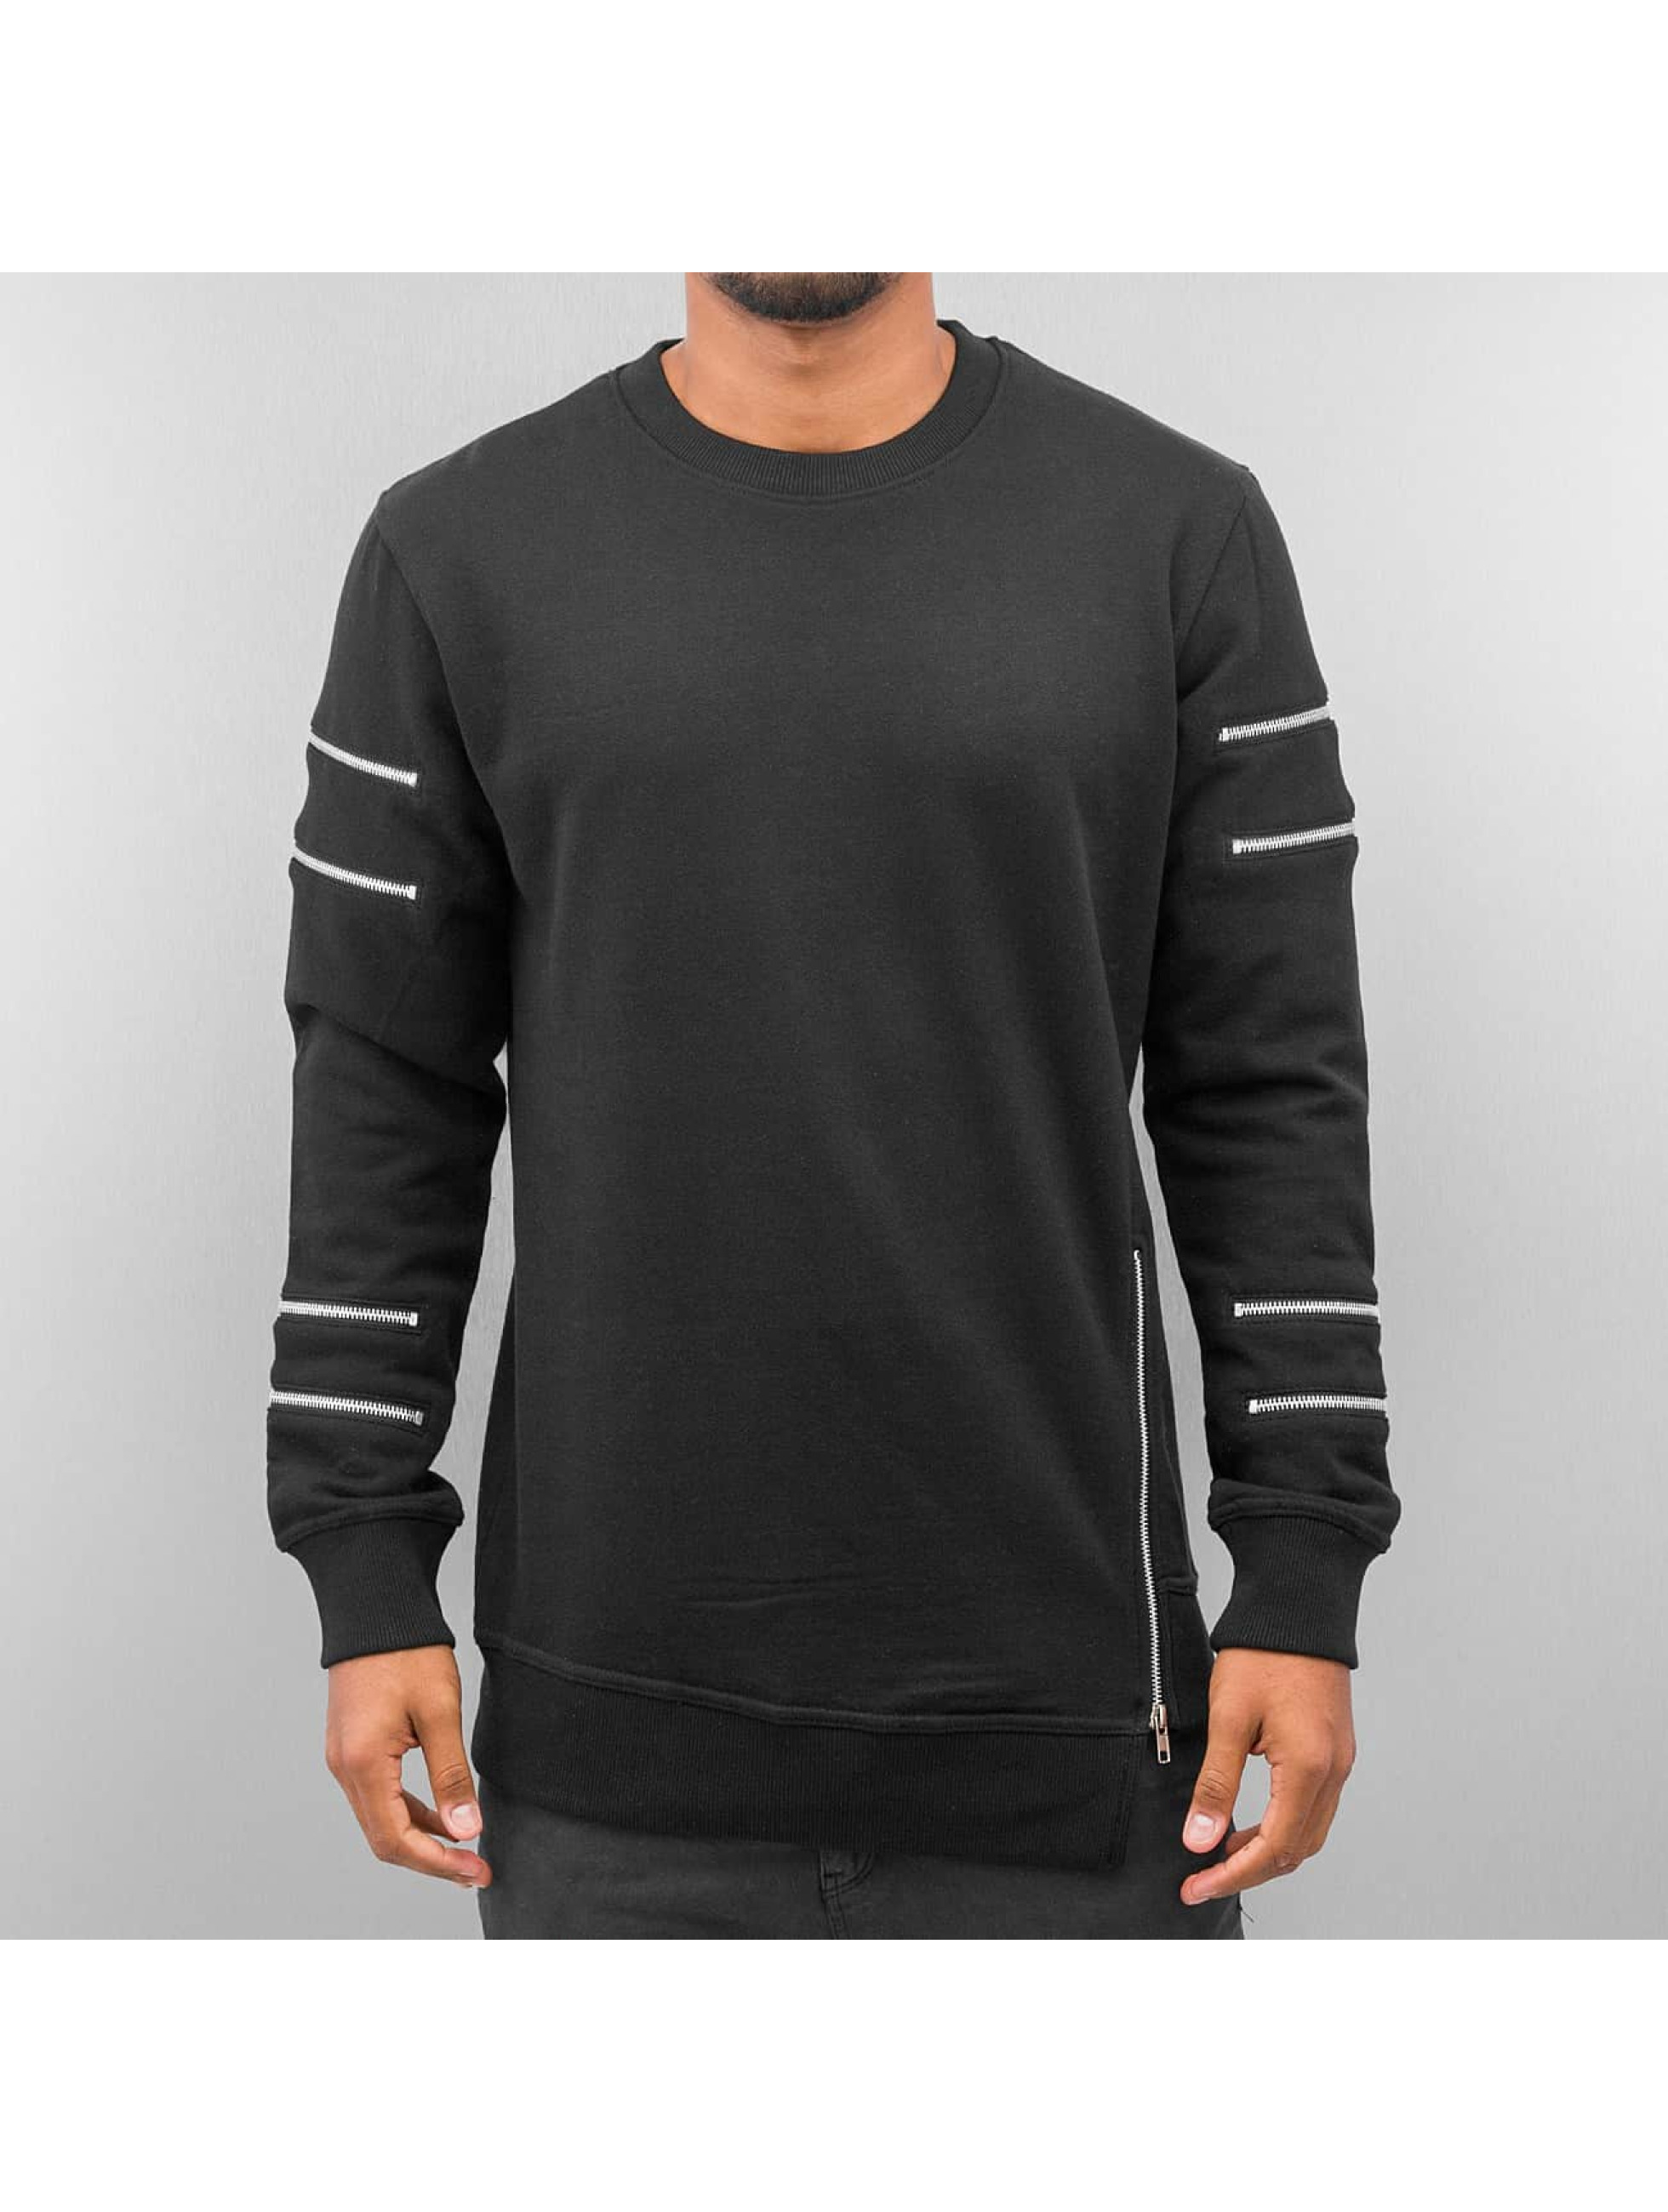 Bangastic Brooklyn Sweatshirt Black Sale Angebote